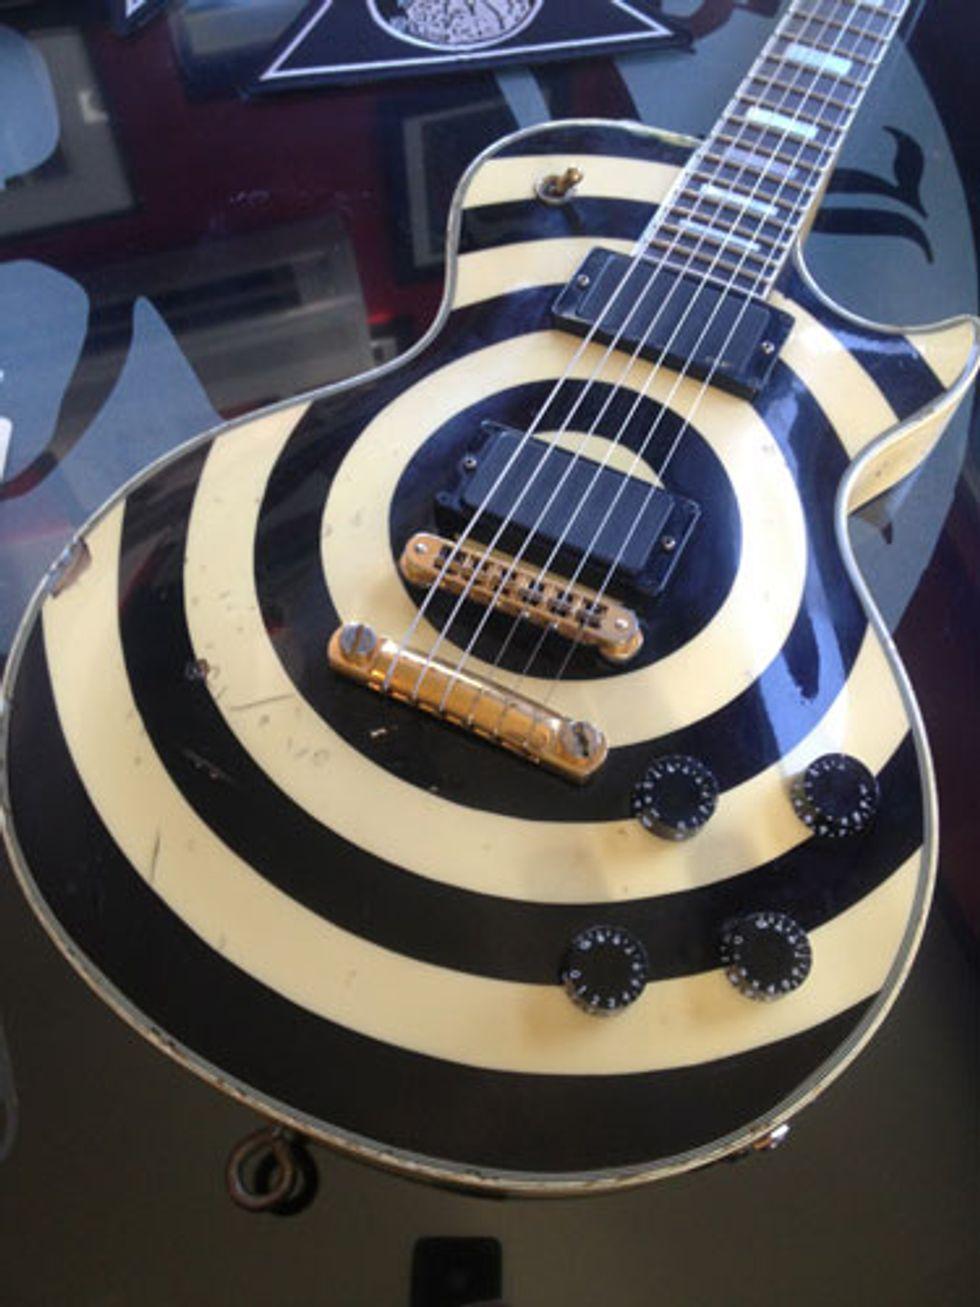 zakk wylde 39 s 5 favorite les pauls 2013 12 04 premier guitar. Black Bedroom Furniture Sets. Home Design Ideas